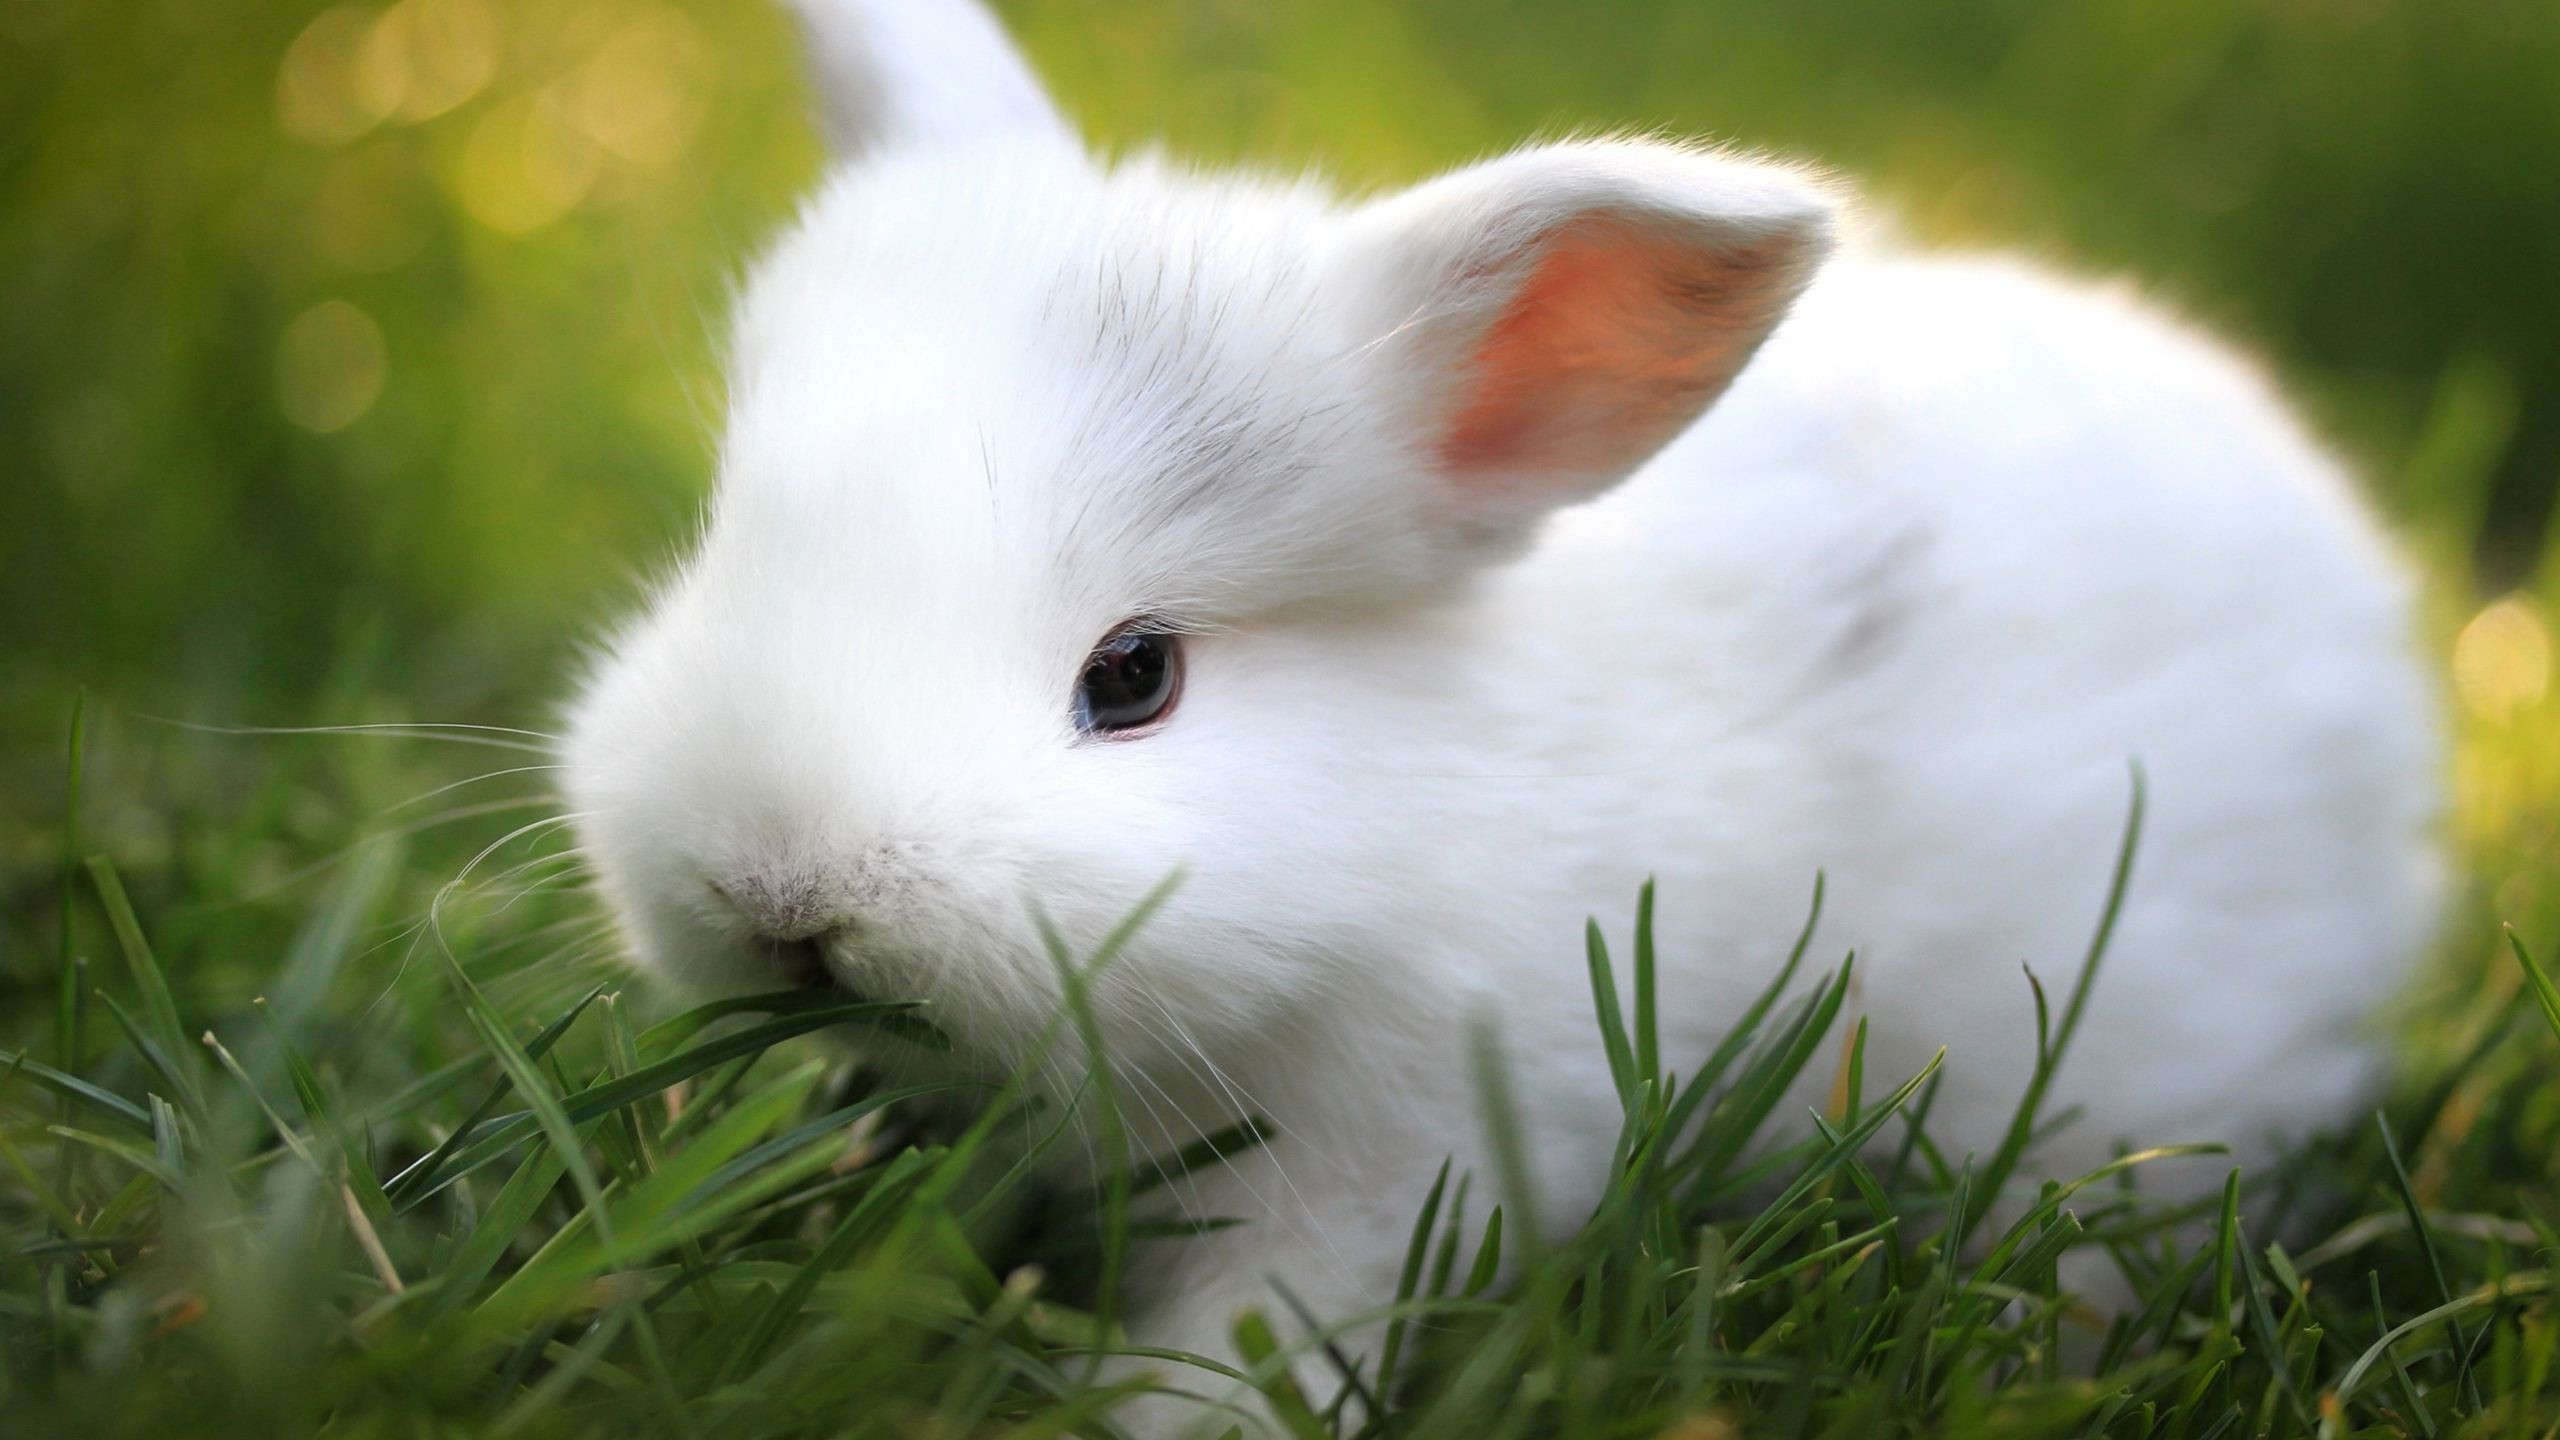 Free Cute Bunny Wallpaper · Rabbit WallpaperHd WallpaperWallpapersDesktop  …